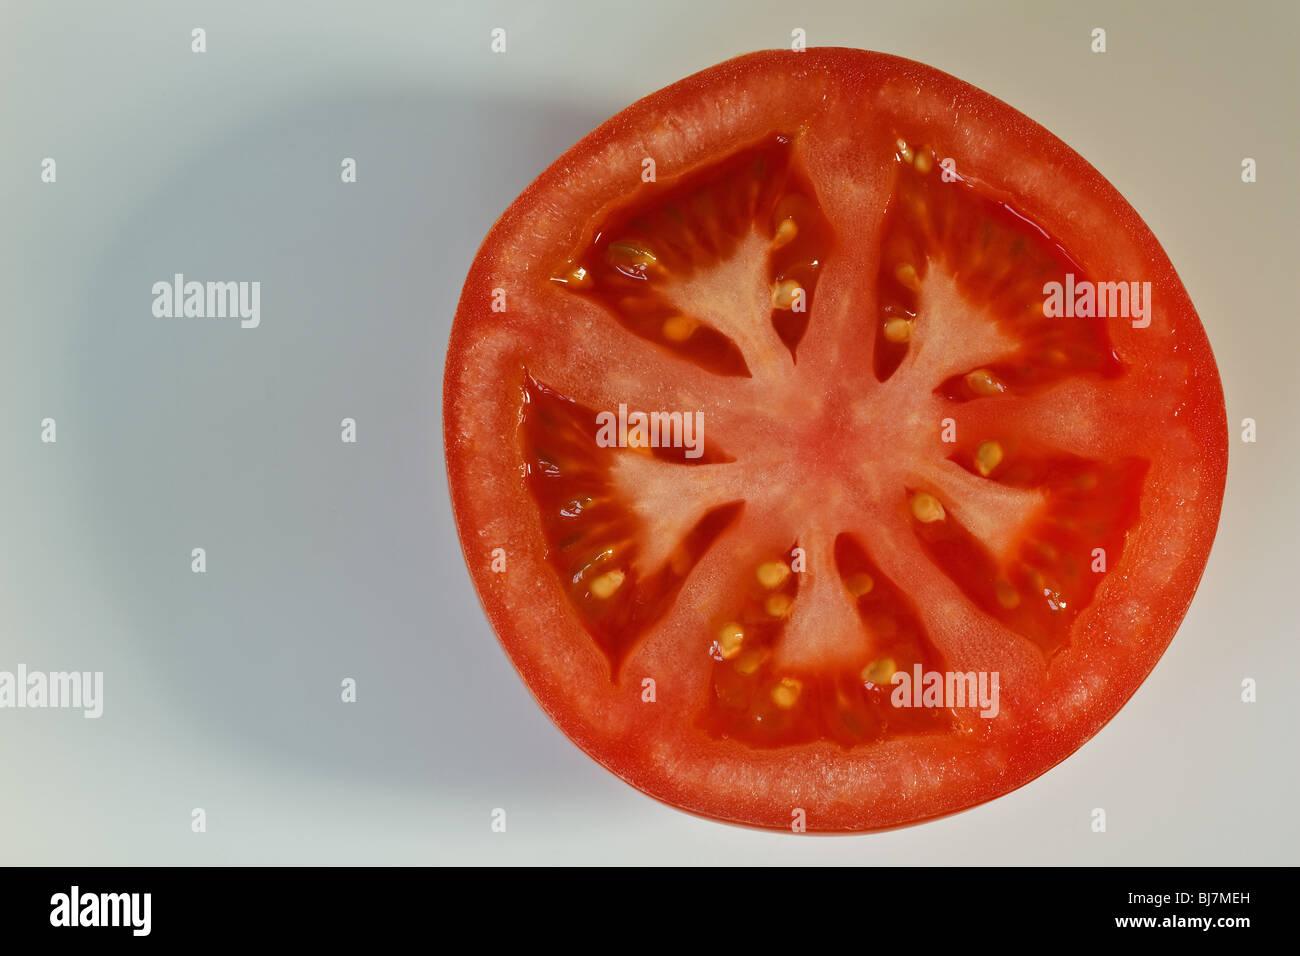 Close-up image of a half tomato - Stock Image